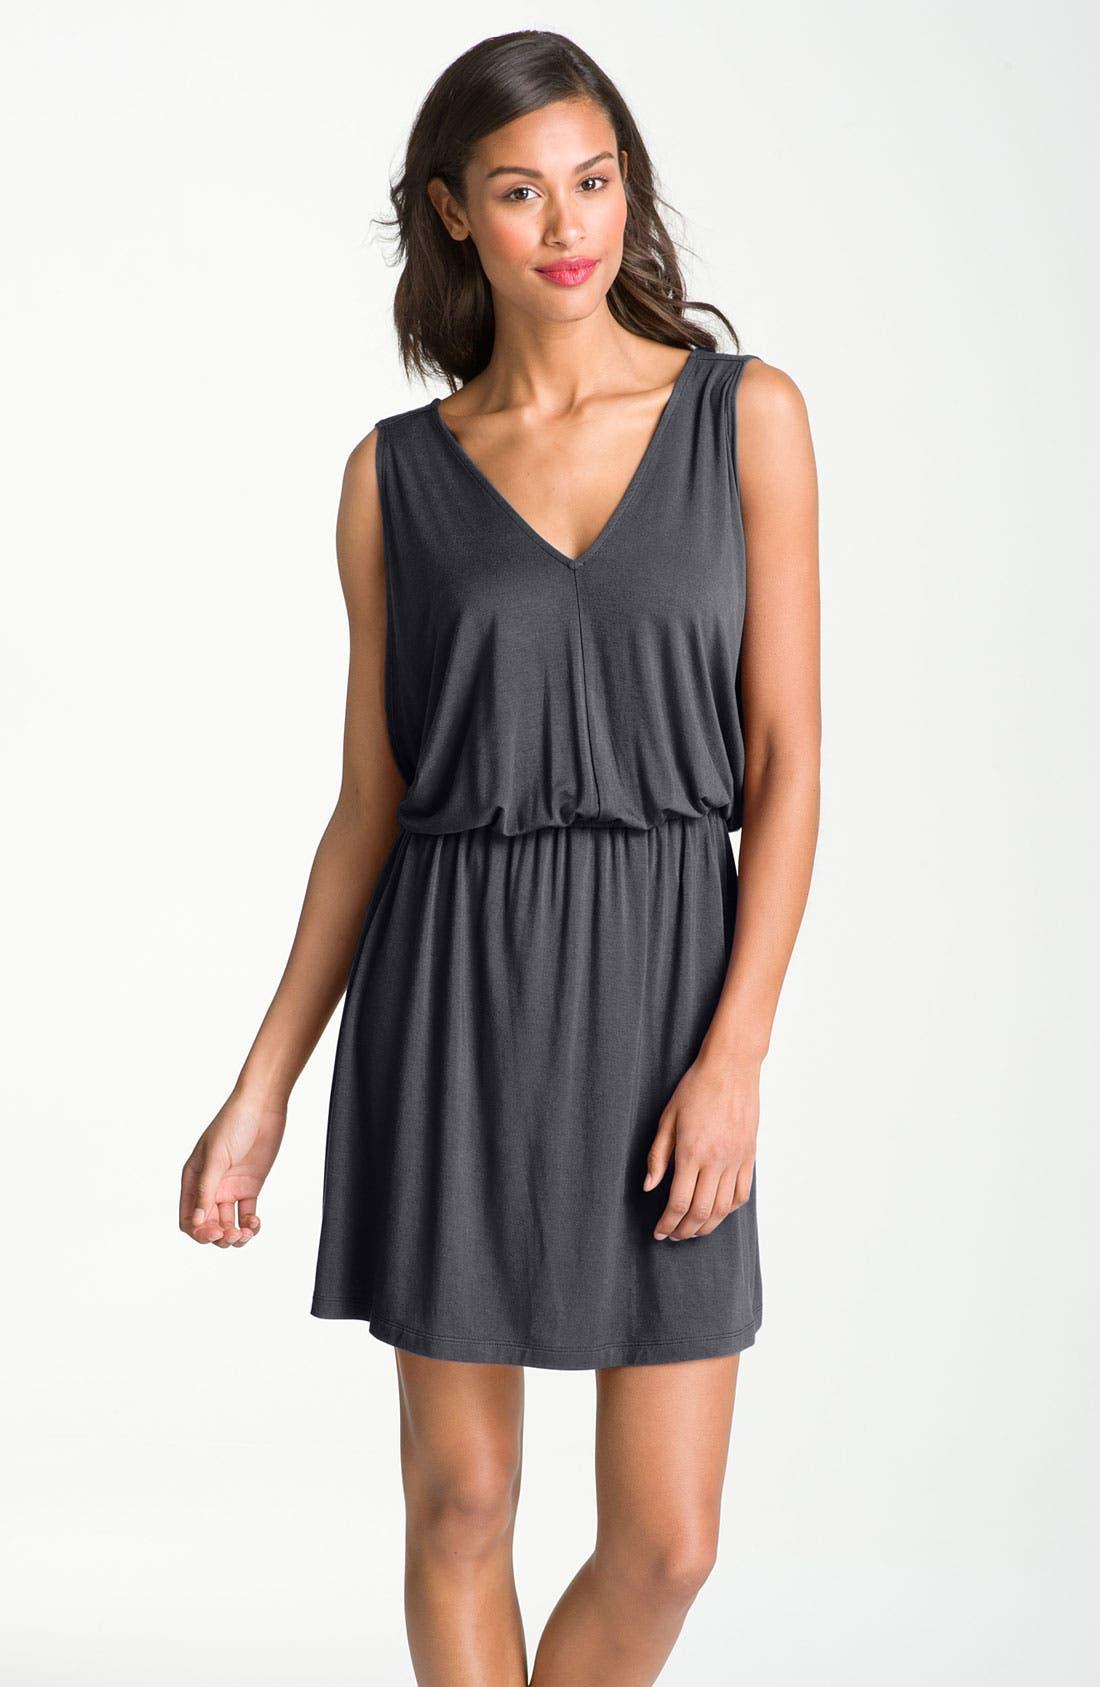 Alternate Image 1 Selected - Caslon® V-Neck Print Knit Dress